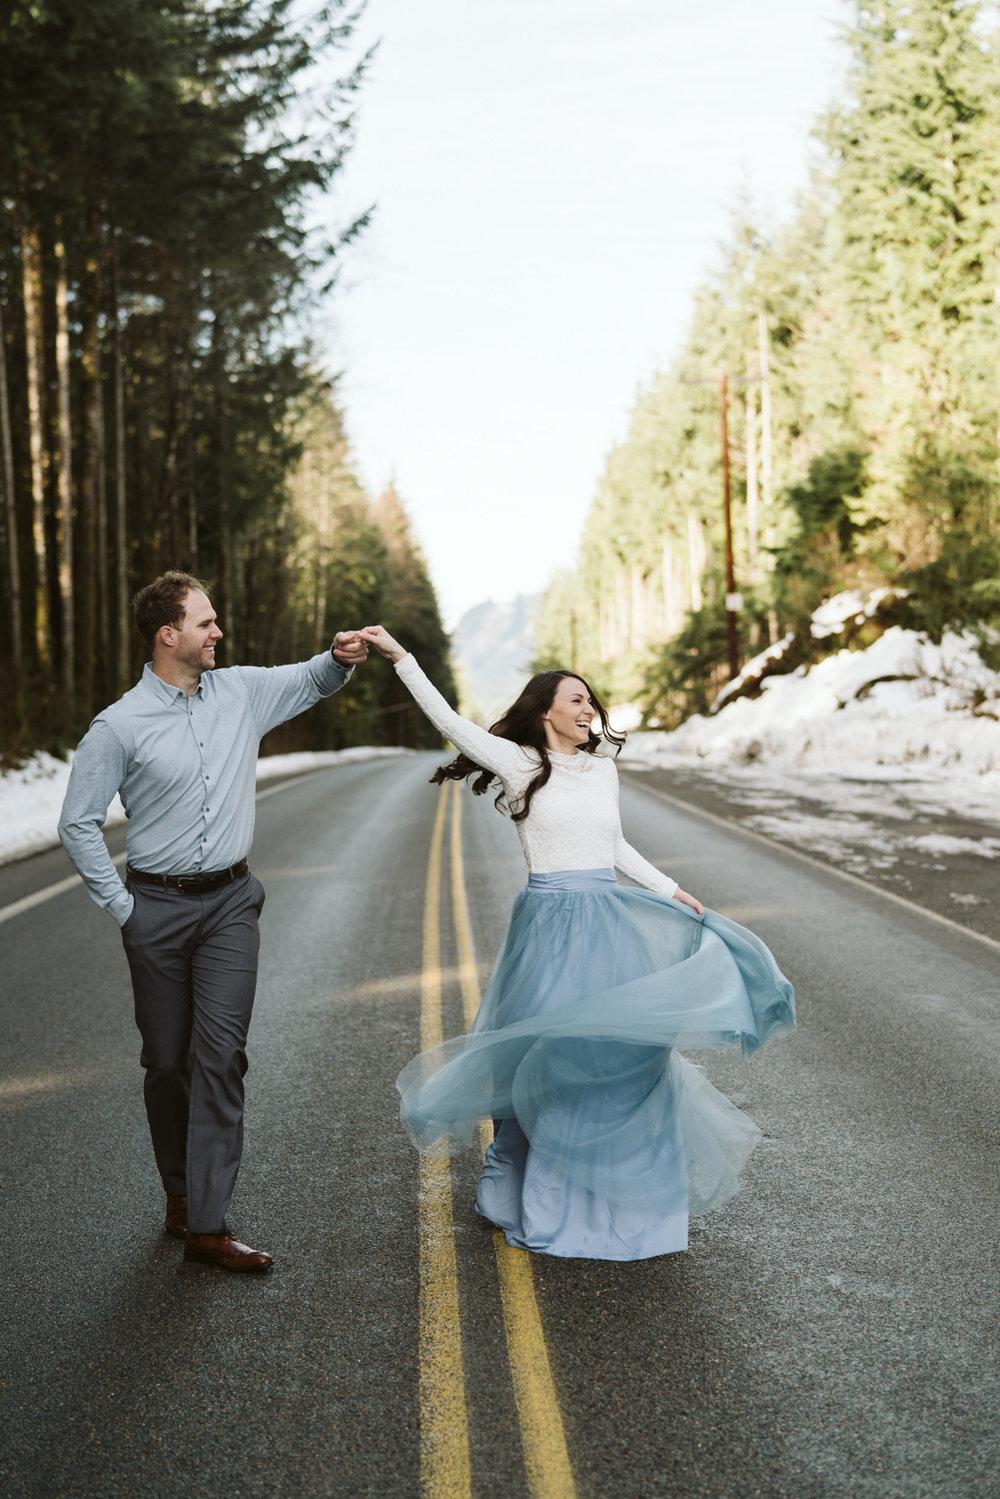 April Yentas Photography - Ethan & Nerissa-56.jpg